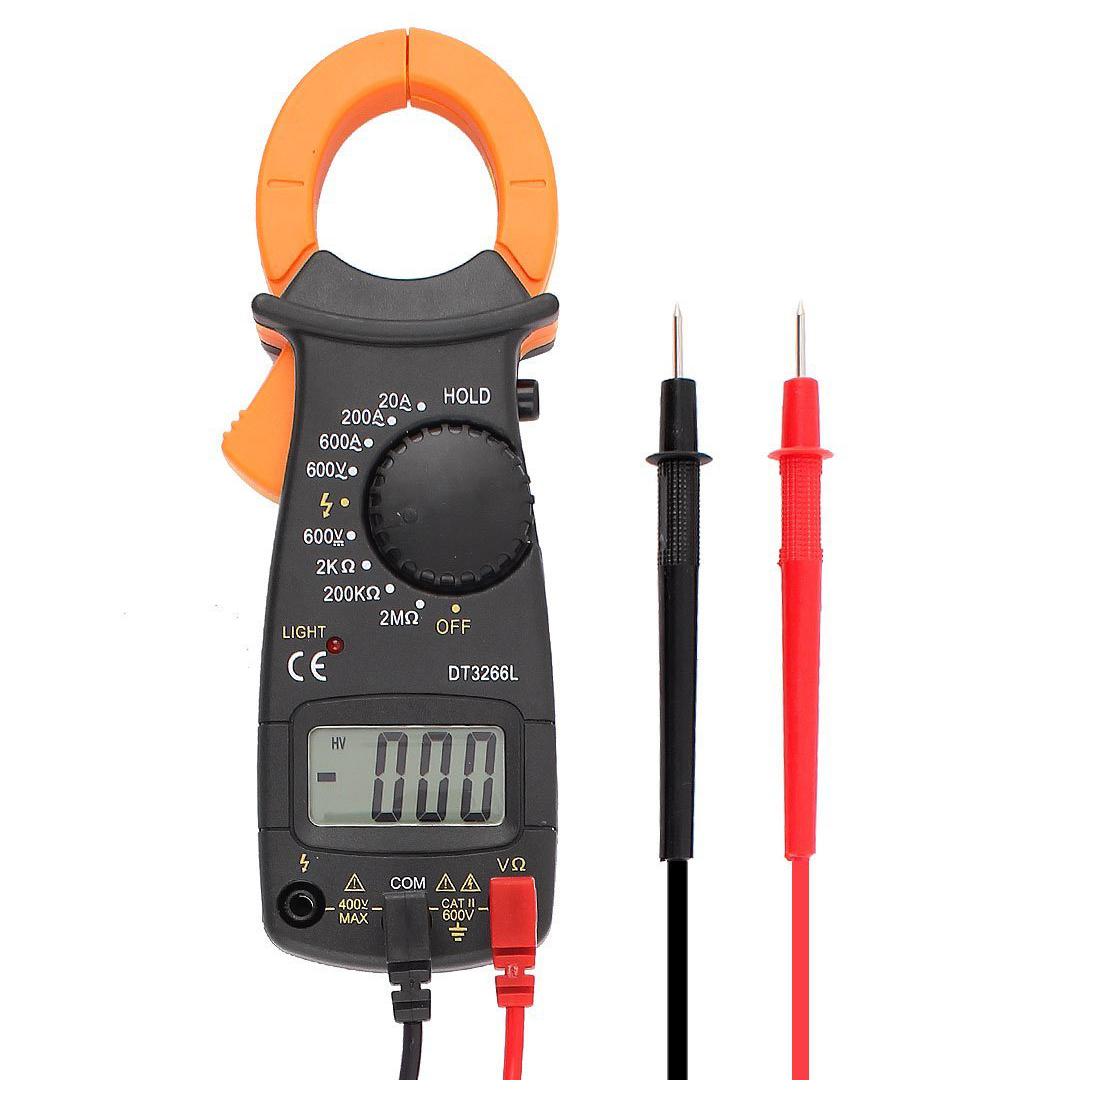 Fie Digital Clamp Meter : Digital clamp meter for v fire protection d ebay